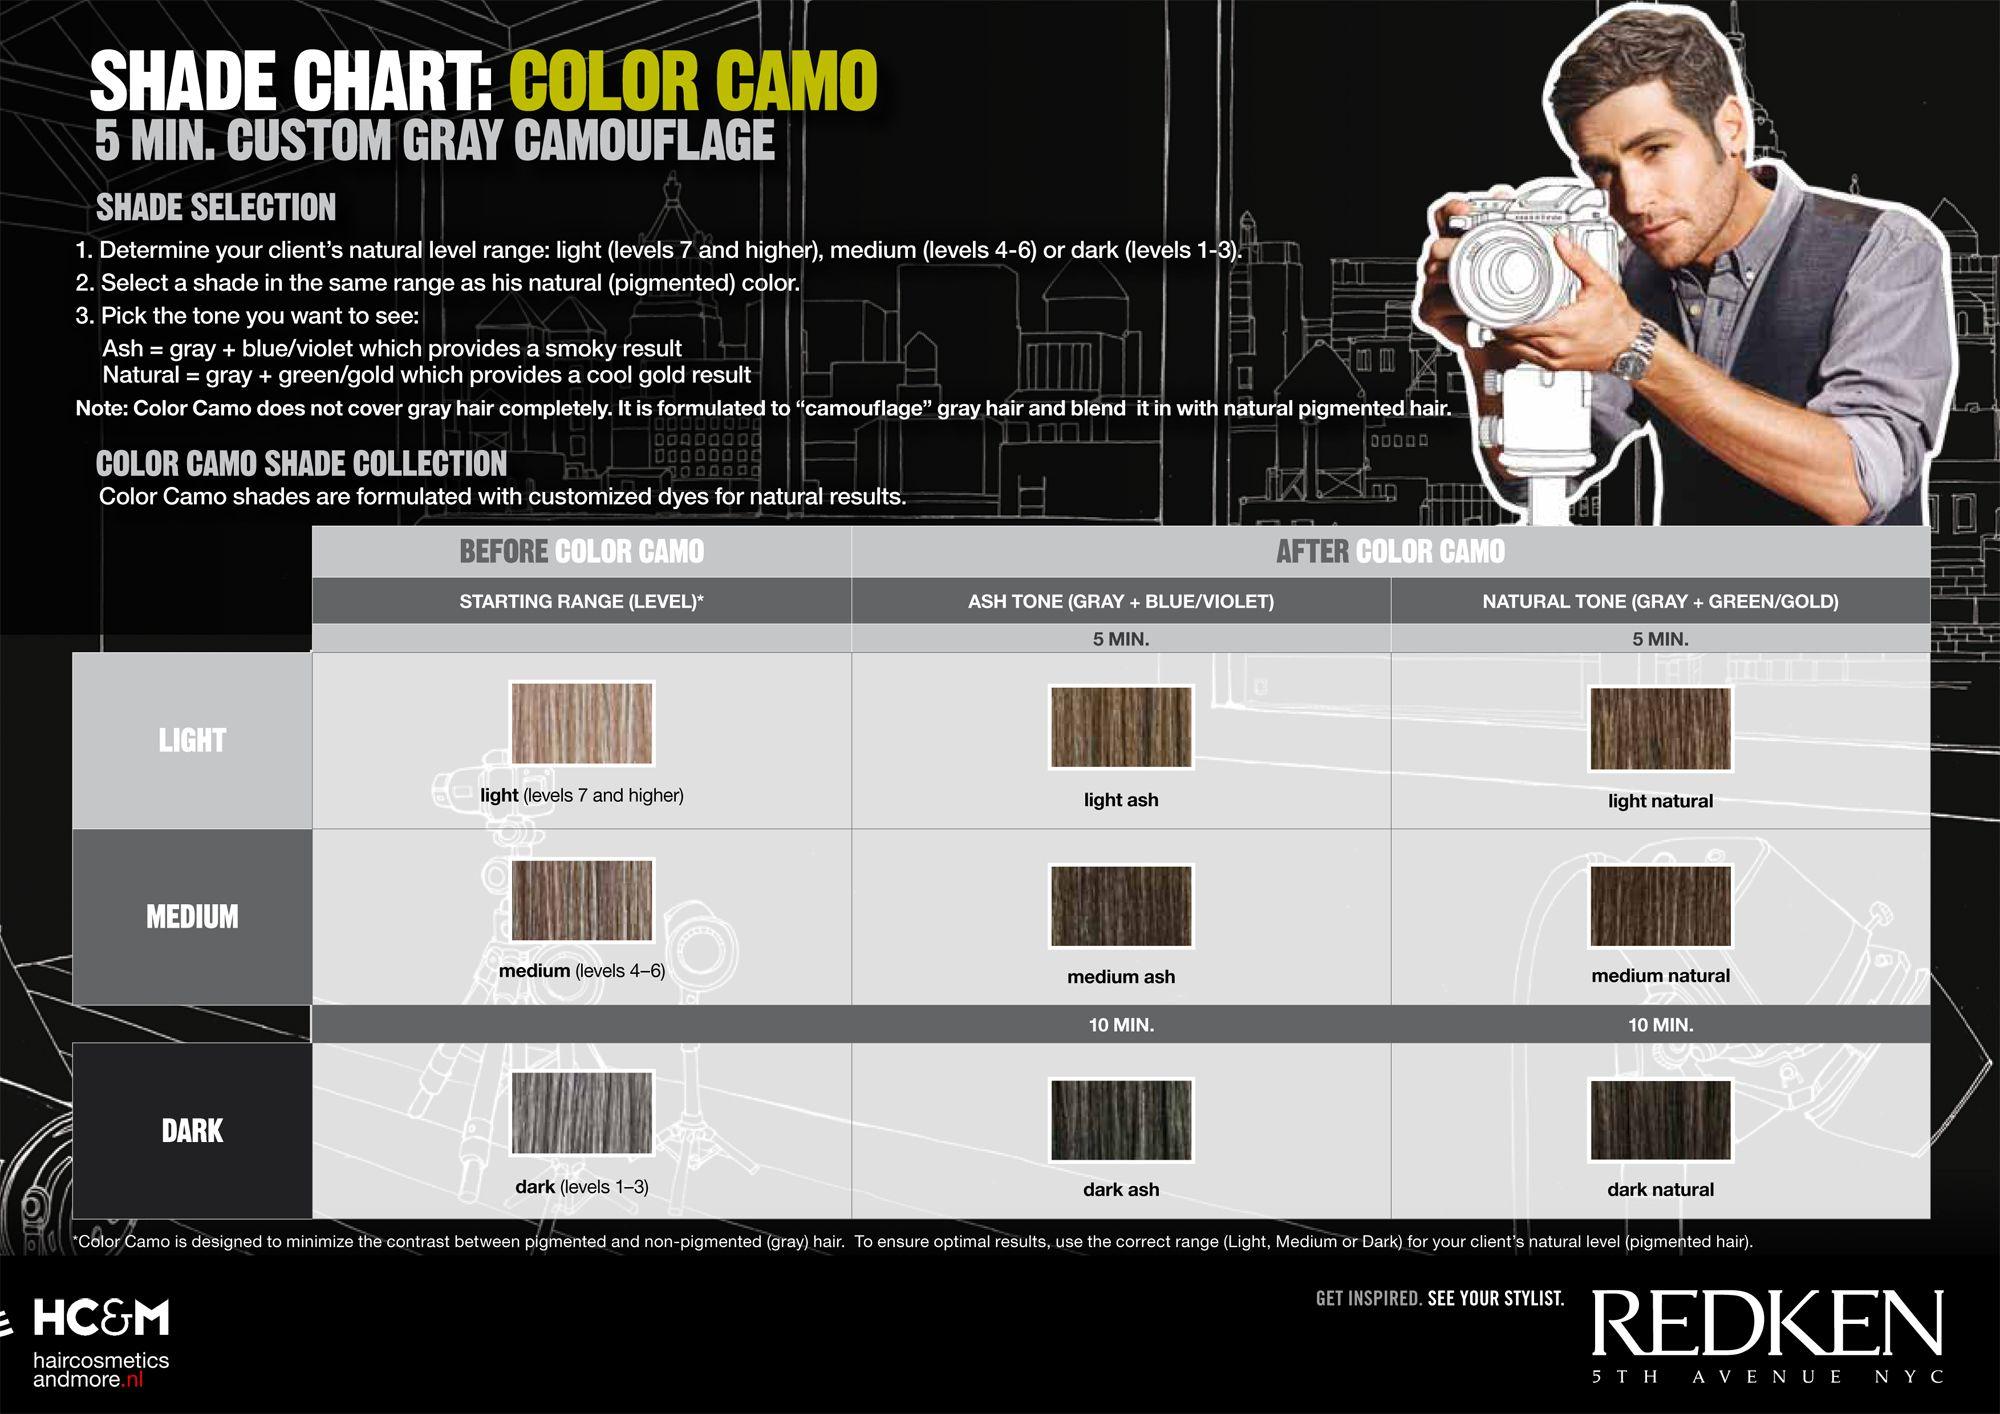 Redken For Men Color Camo Shade Chart